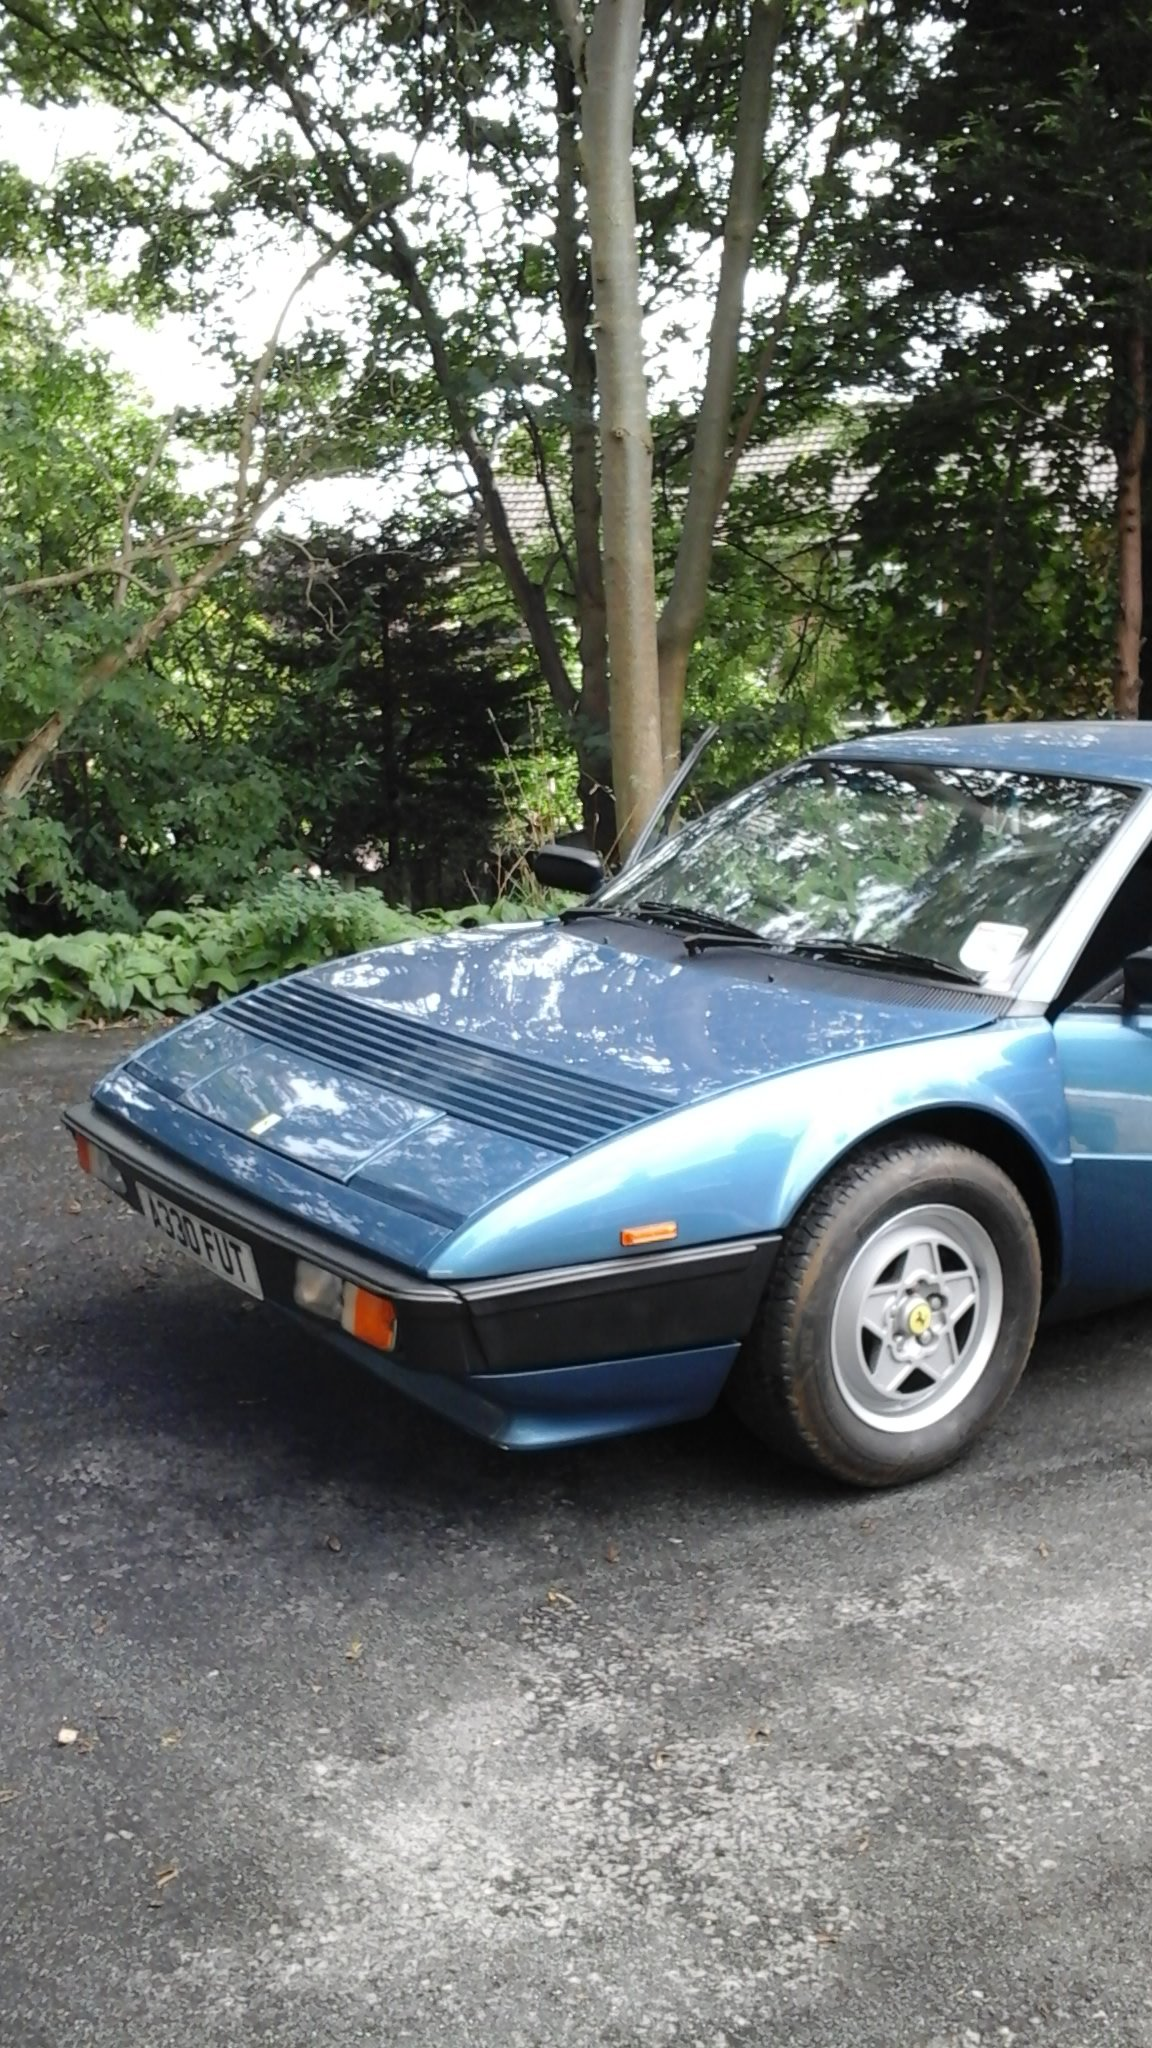 Ferrari Mondial qv 1983 rhd SOLD (picture 2 of 6)